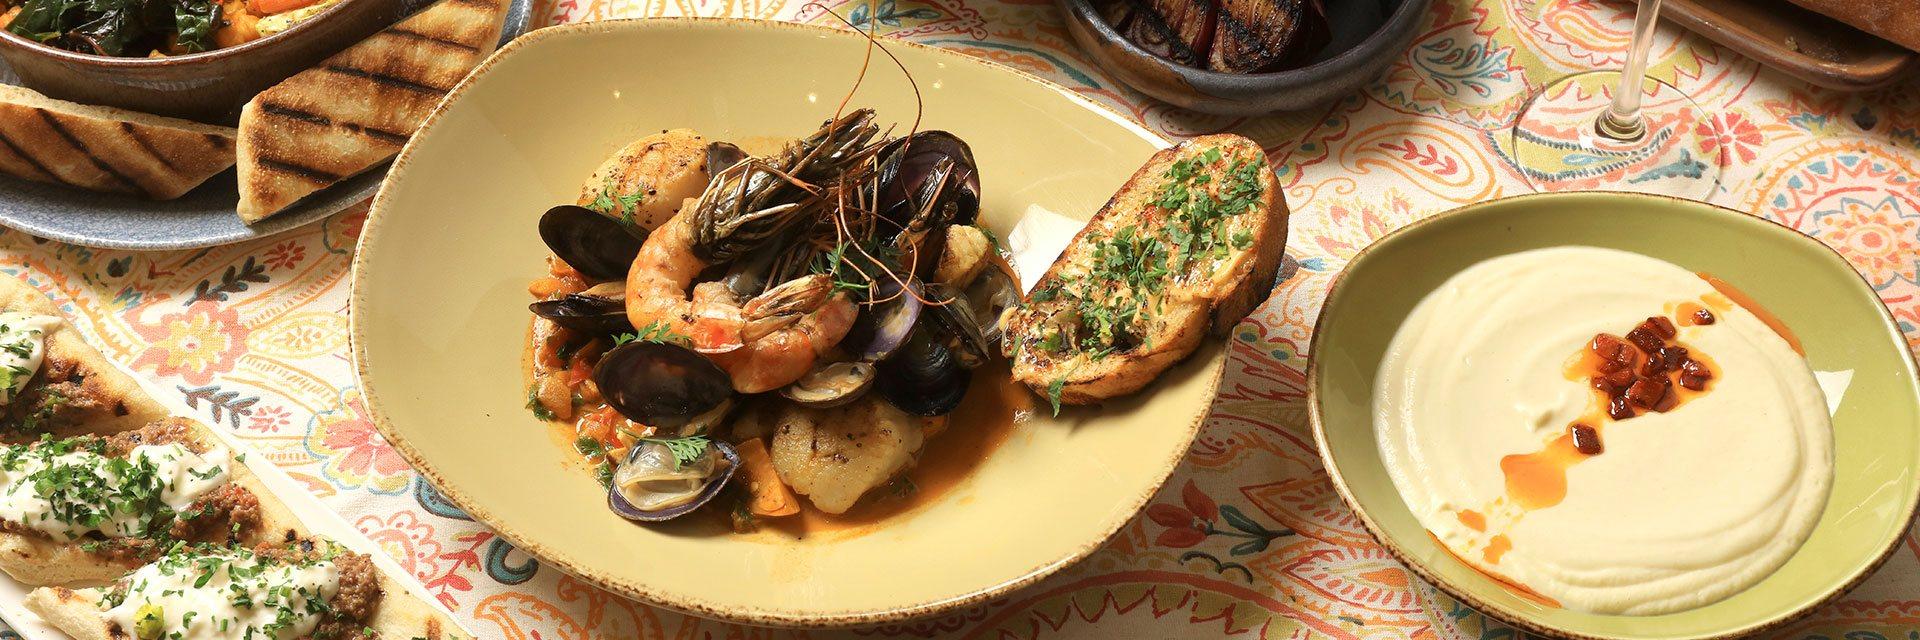 Dining facilities at Casa Munras Garden Hotel & Spa, Monterey